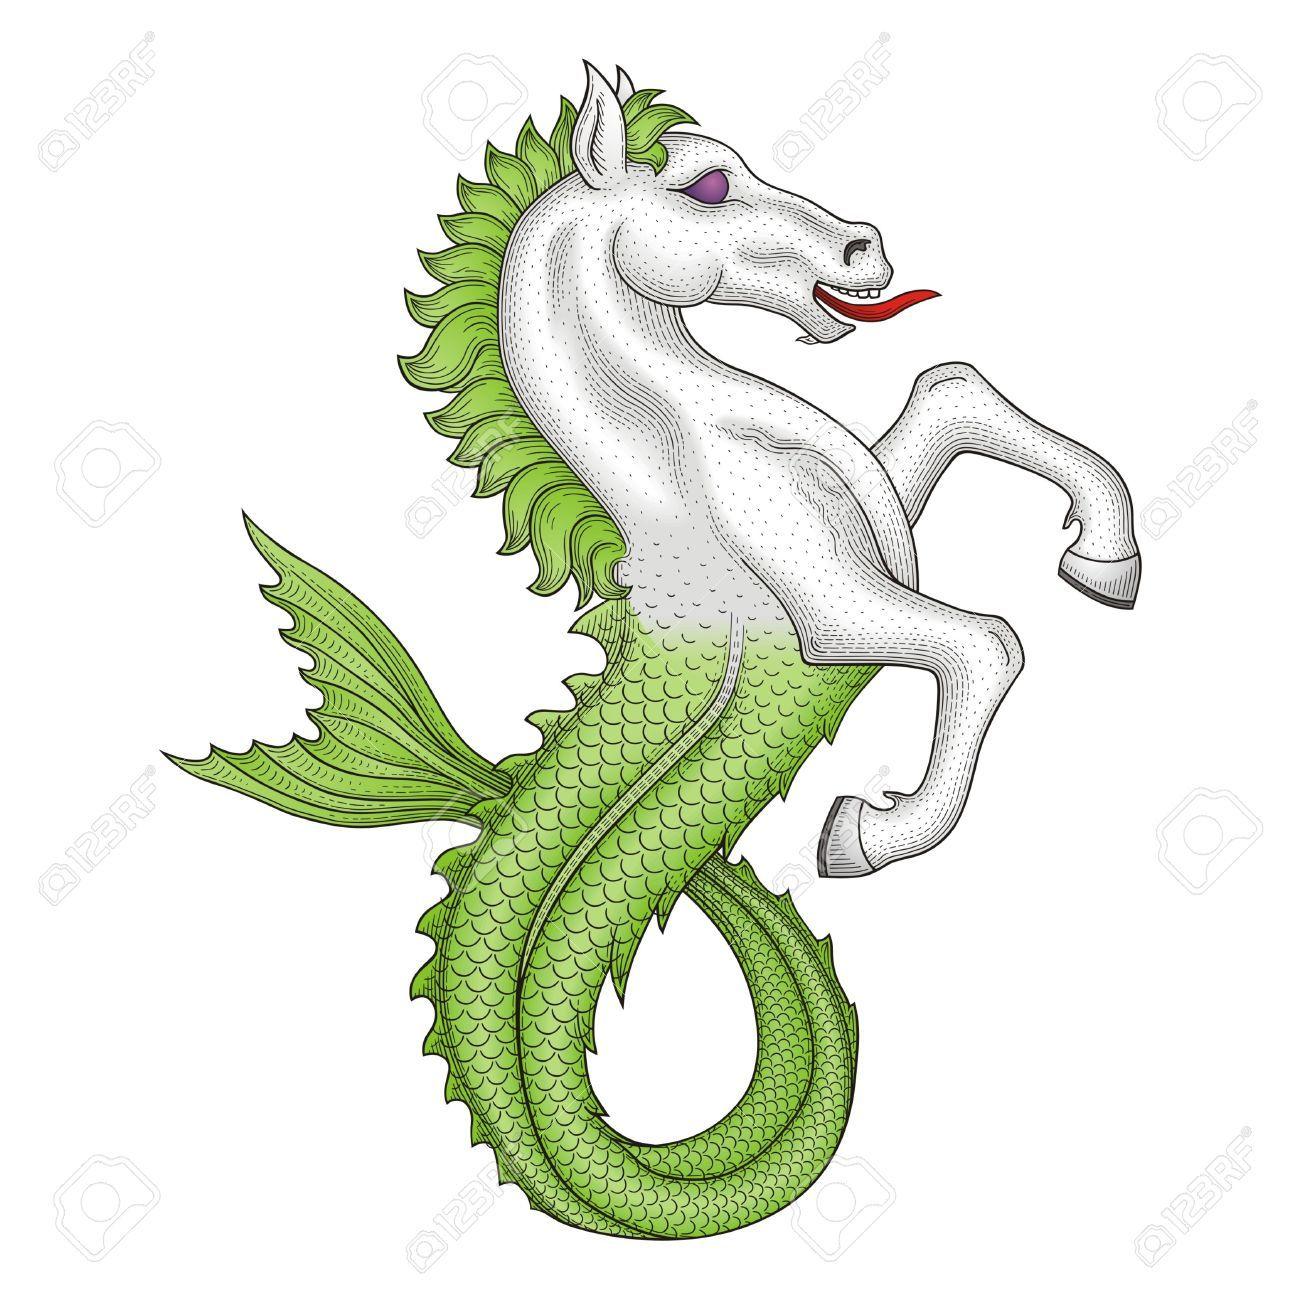 free heraldry cliparts seahorse